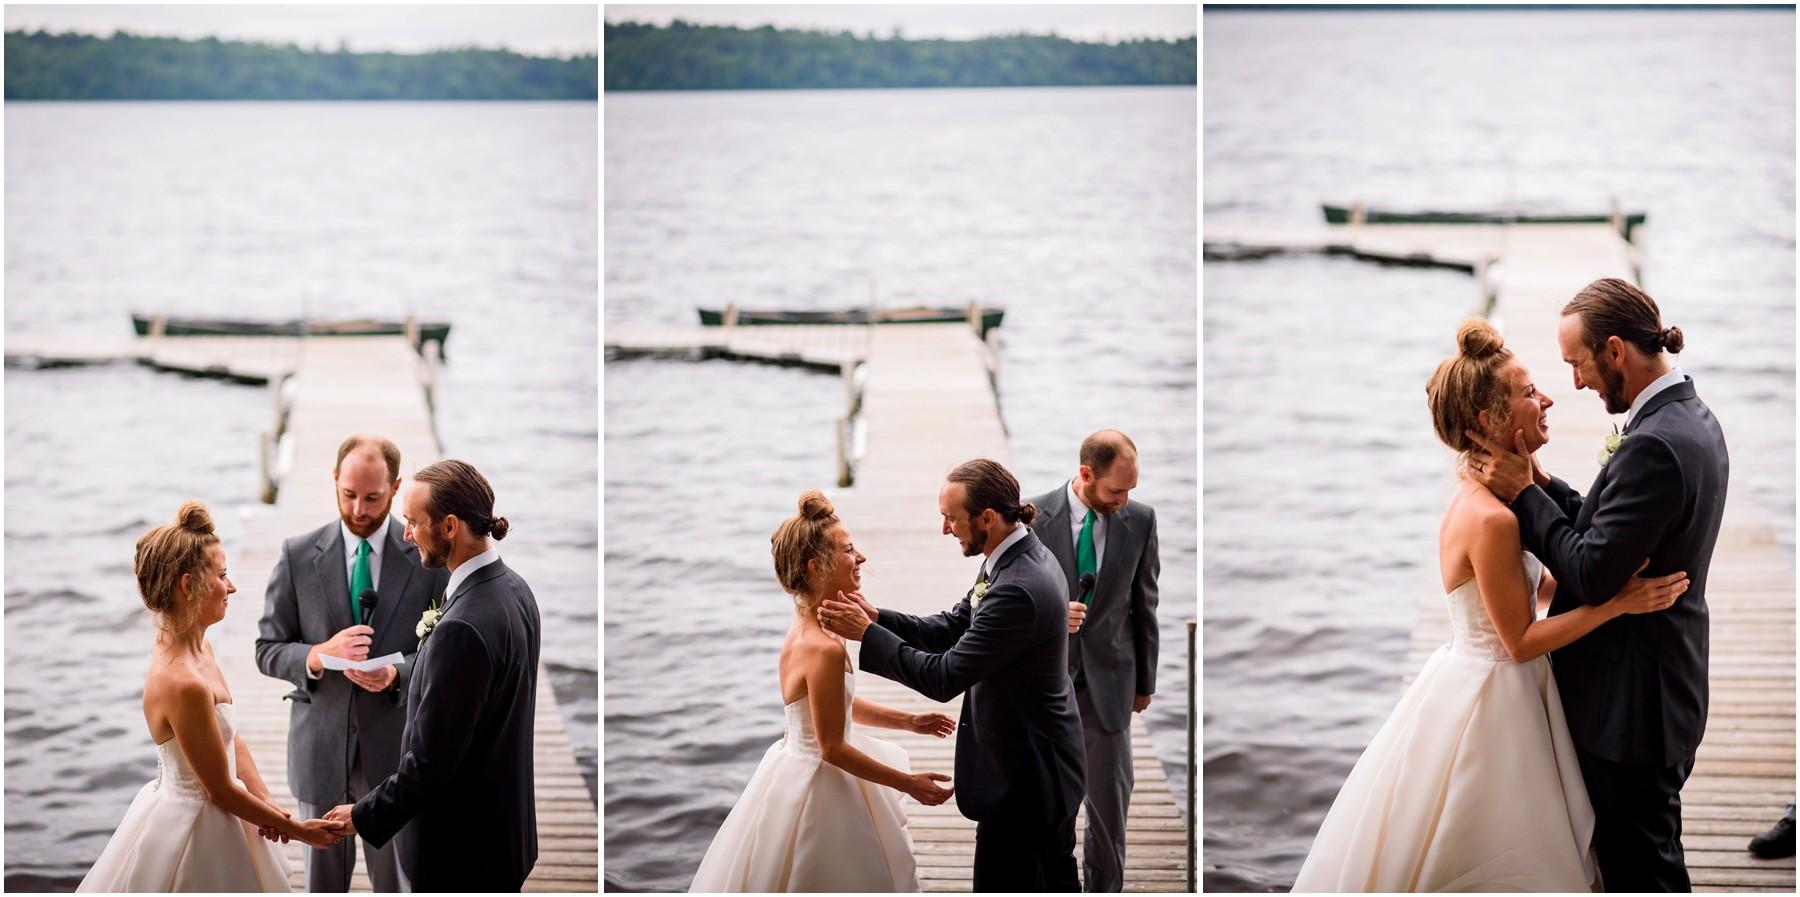 Wisconsin-north-woods-summer-lake-wedding_0072.jpg